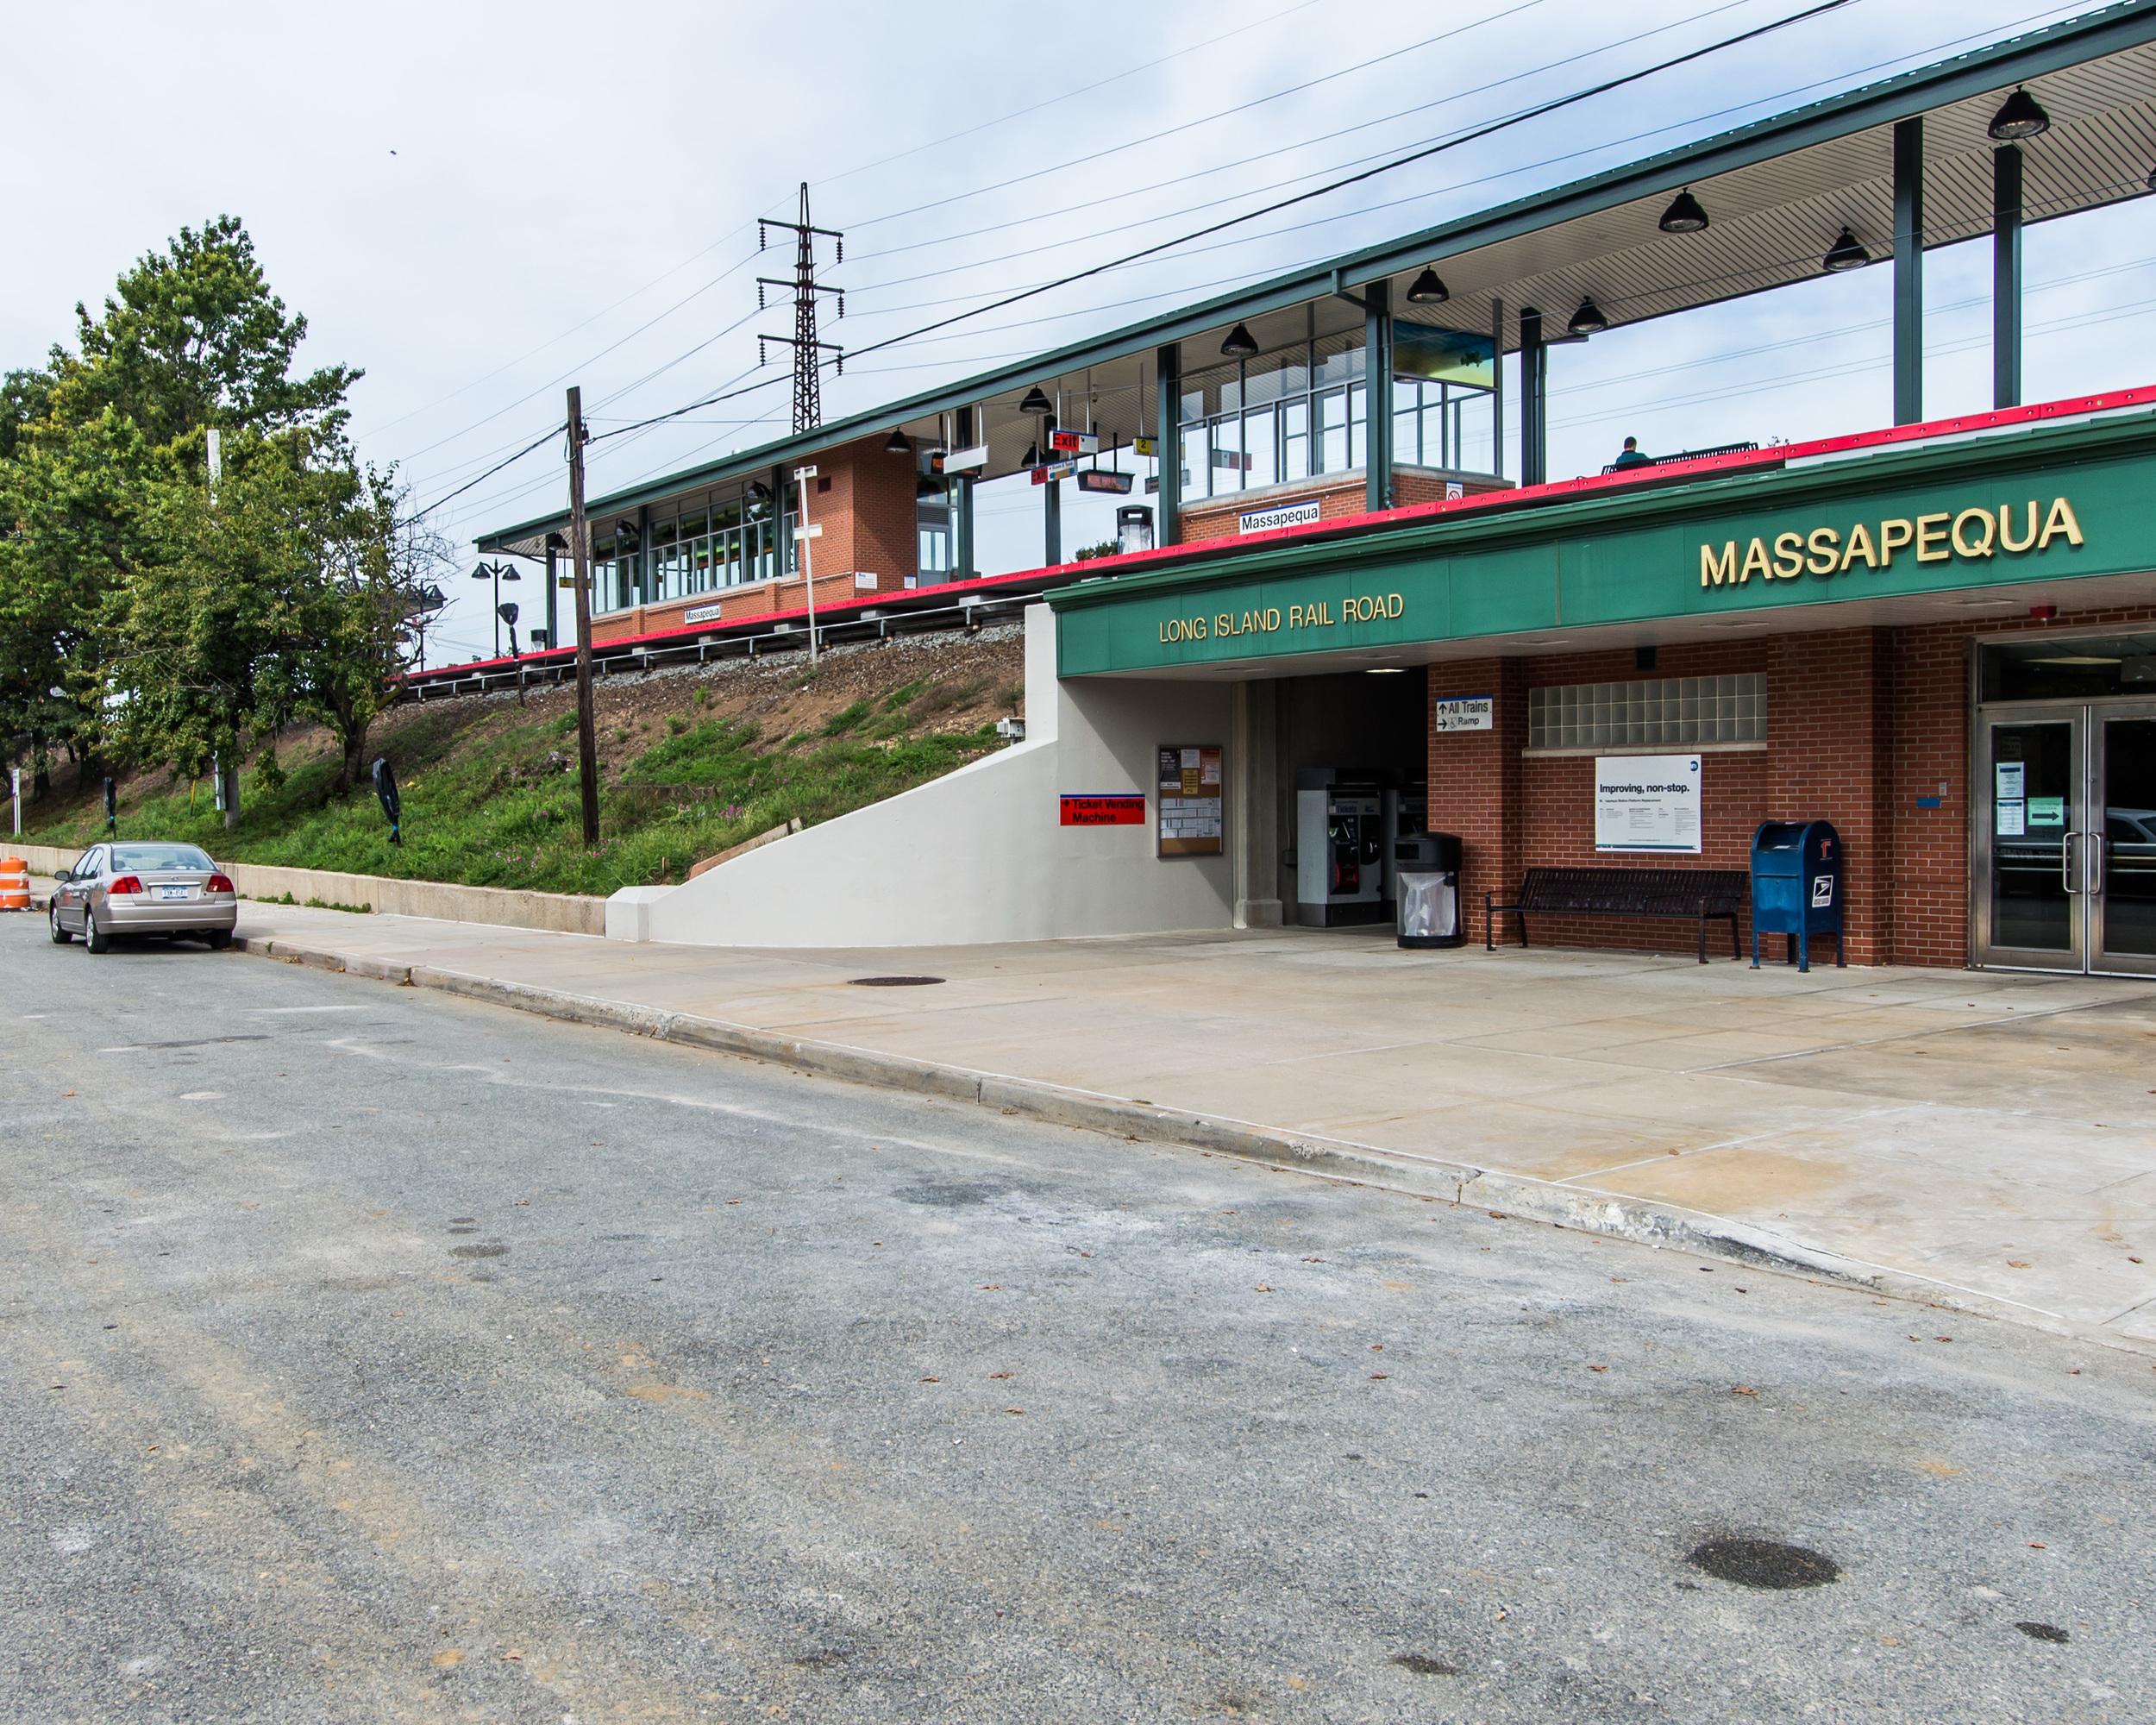 REHABILITATION OF MASSAPEQUA TRAIN STATION